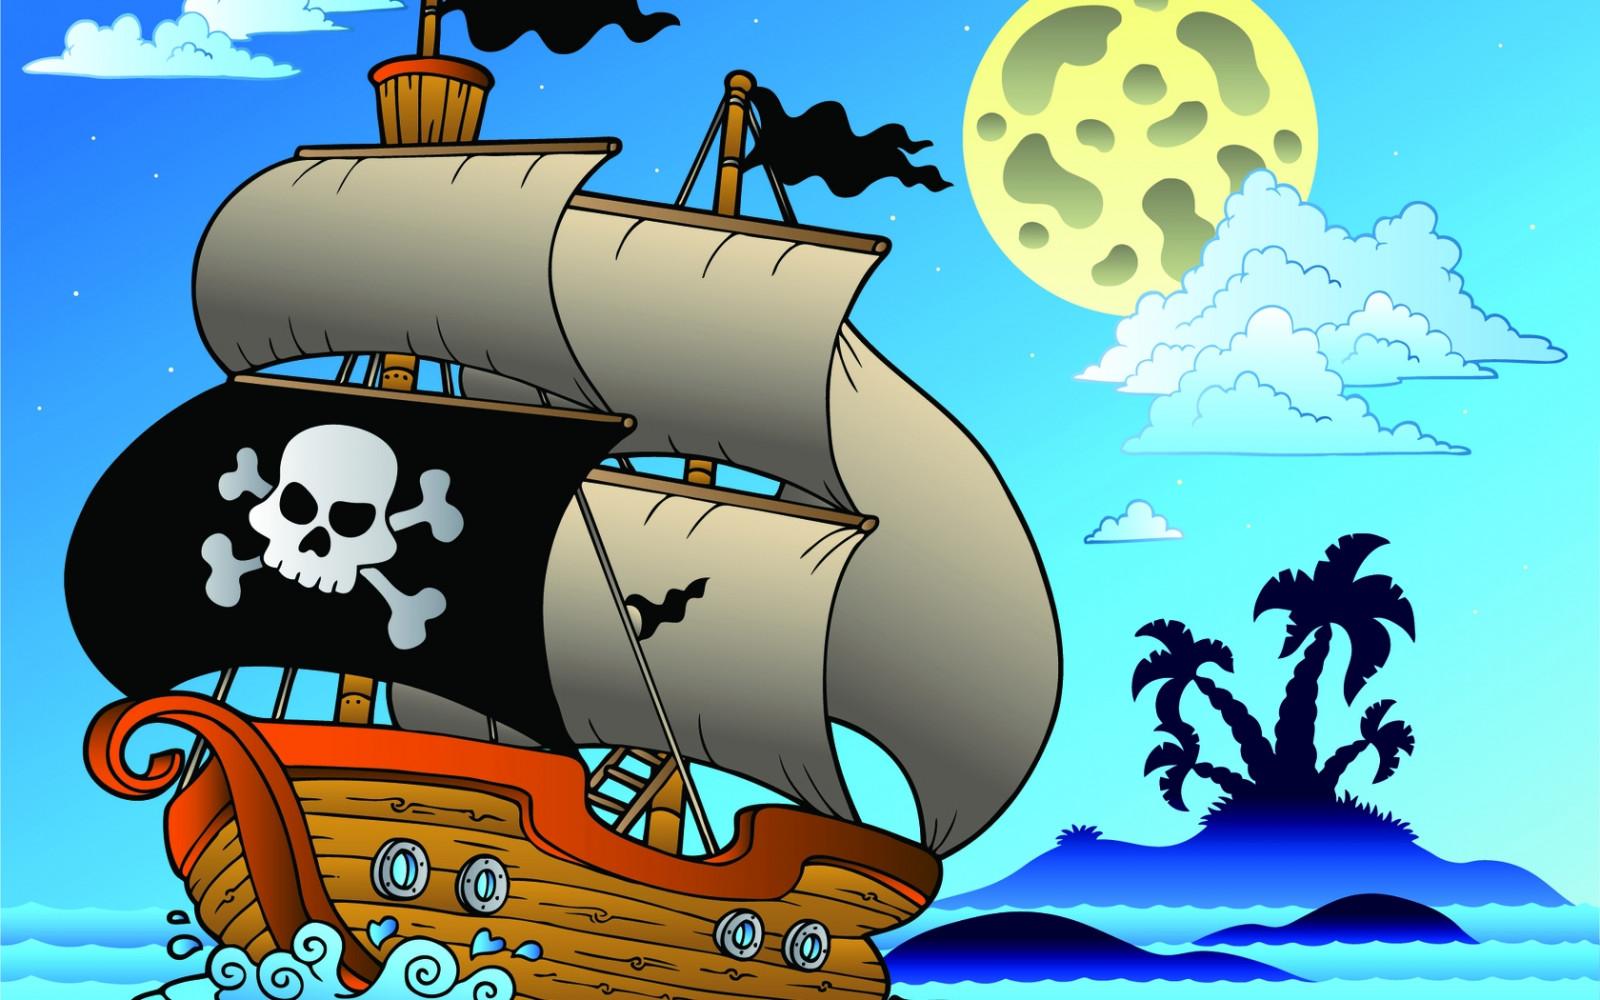 Картинка веселые пираты